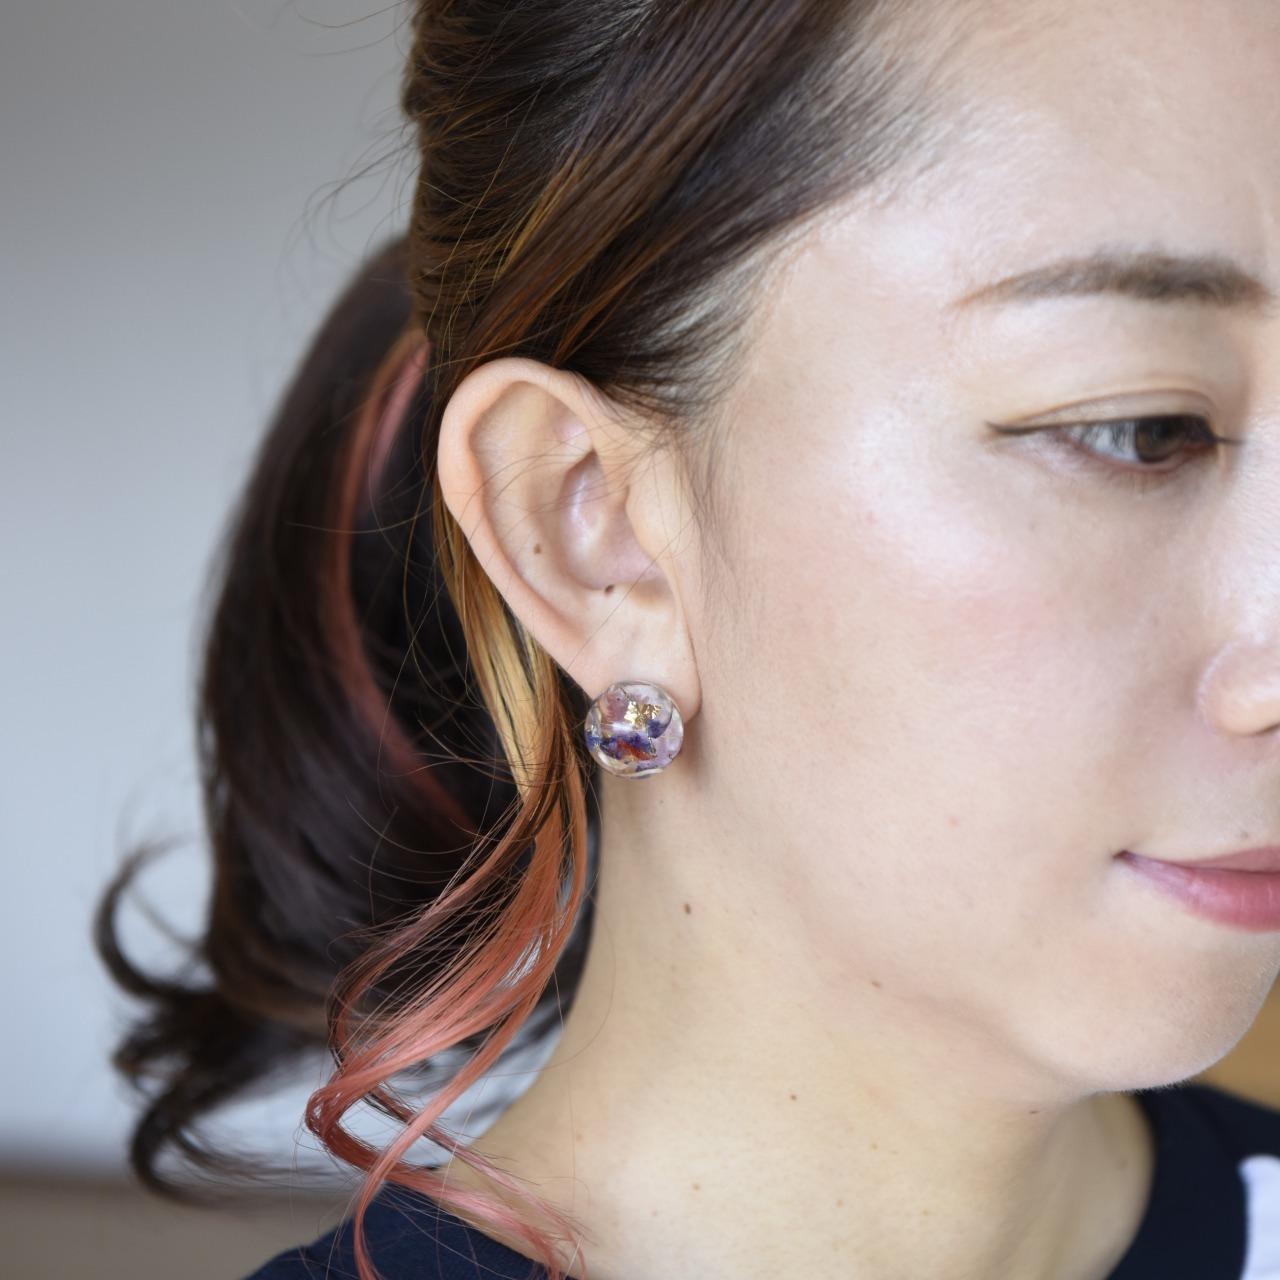 Rie fu x Motomio コラボアクセサリー【ピアス・イヤリング】